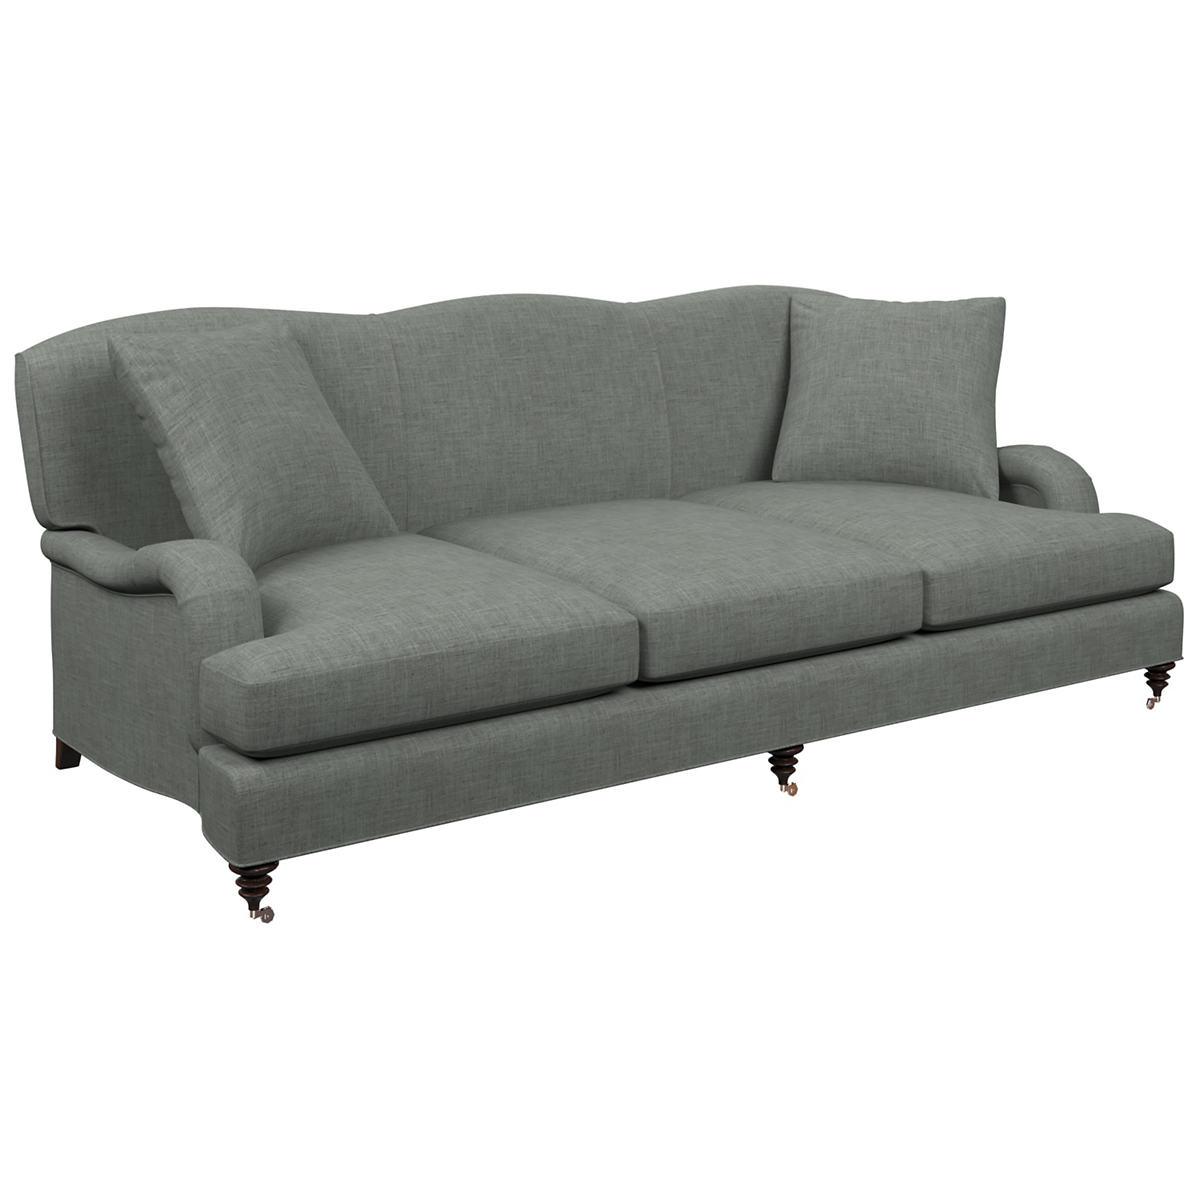 Canvasuede Ocean Litchfield 3 Seater Sofa